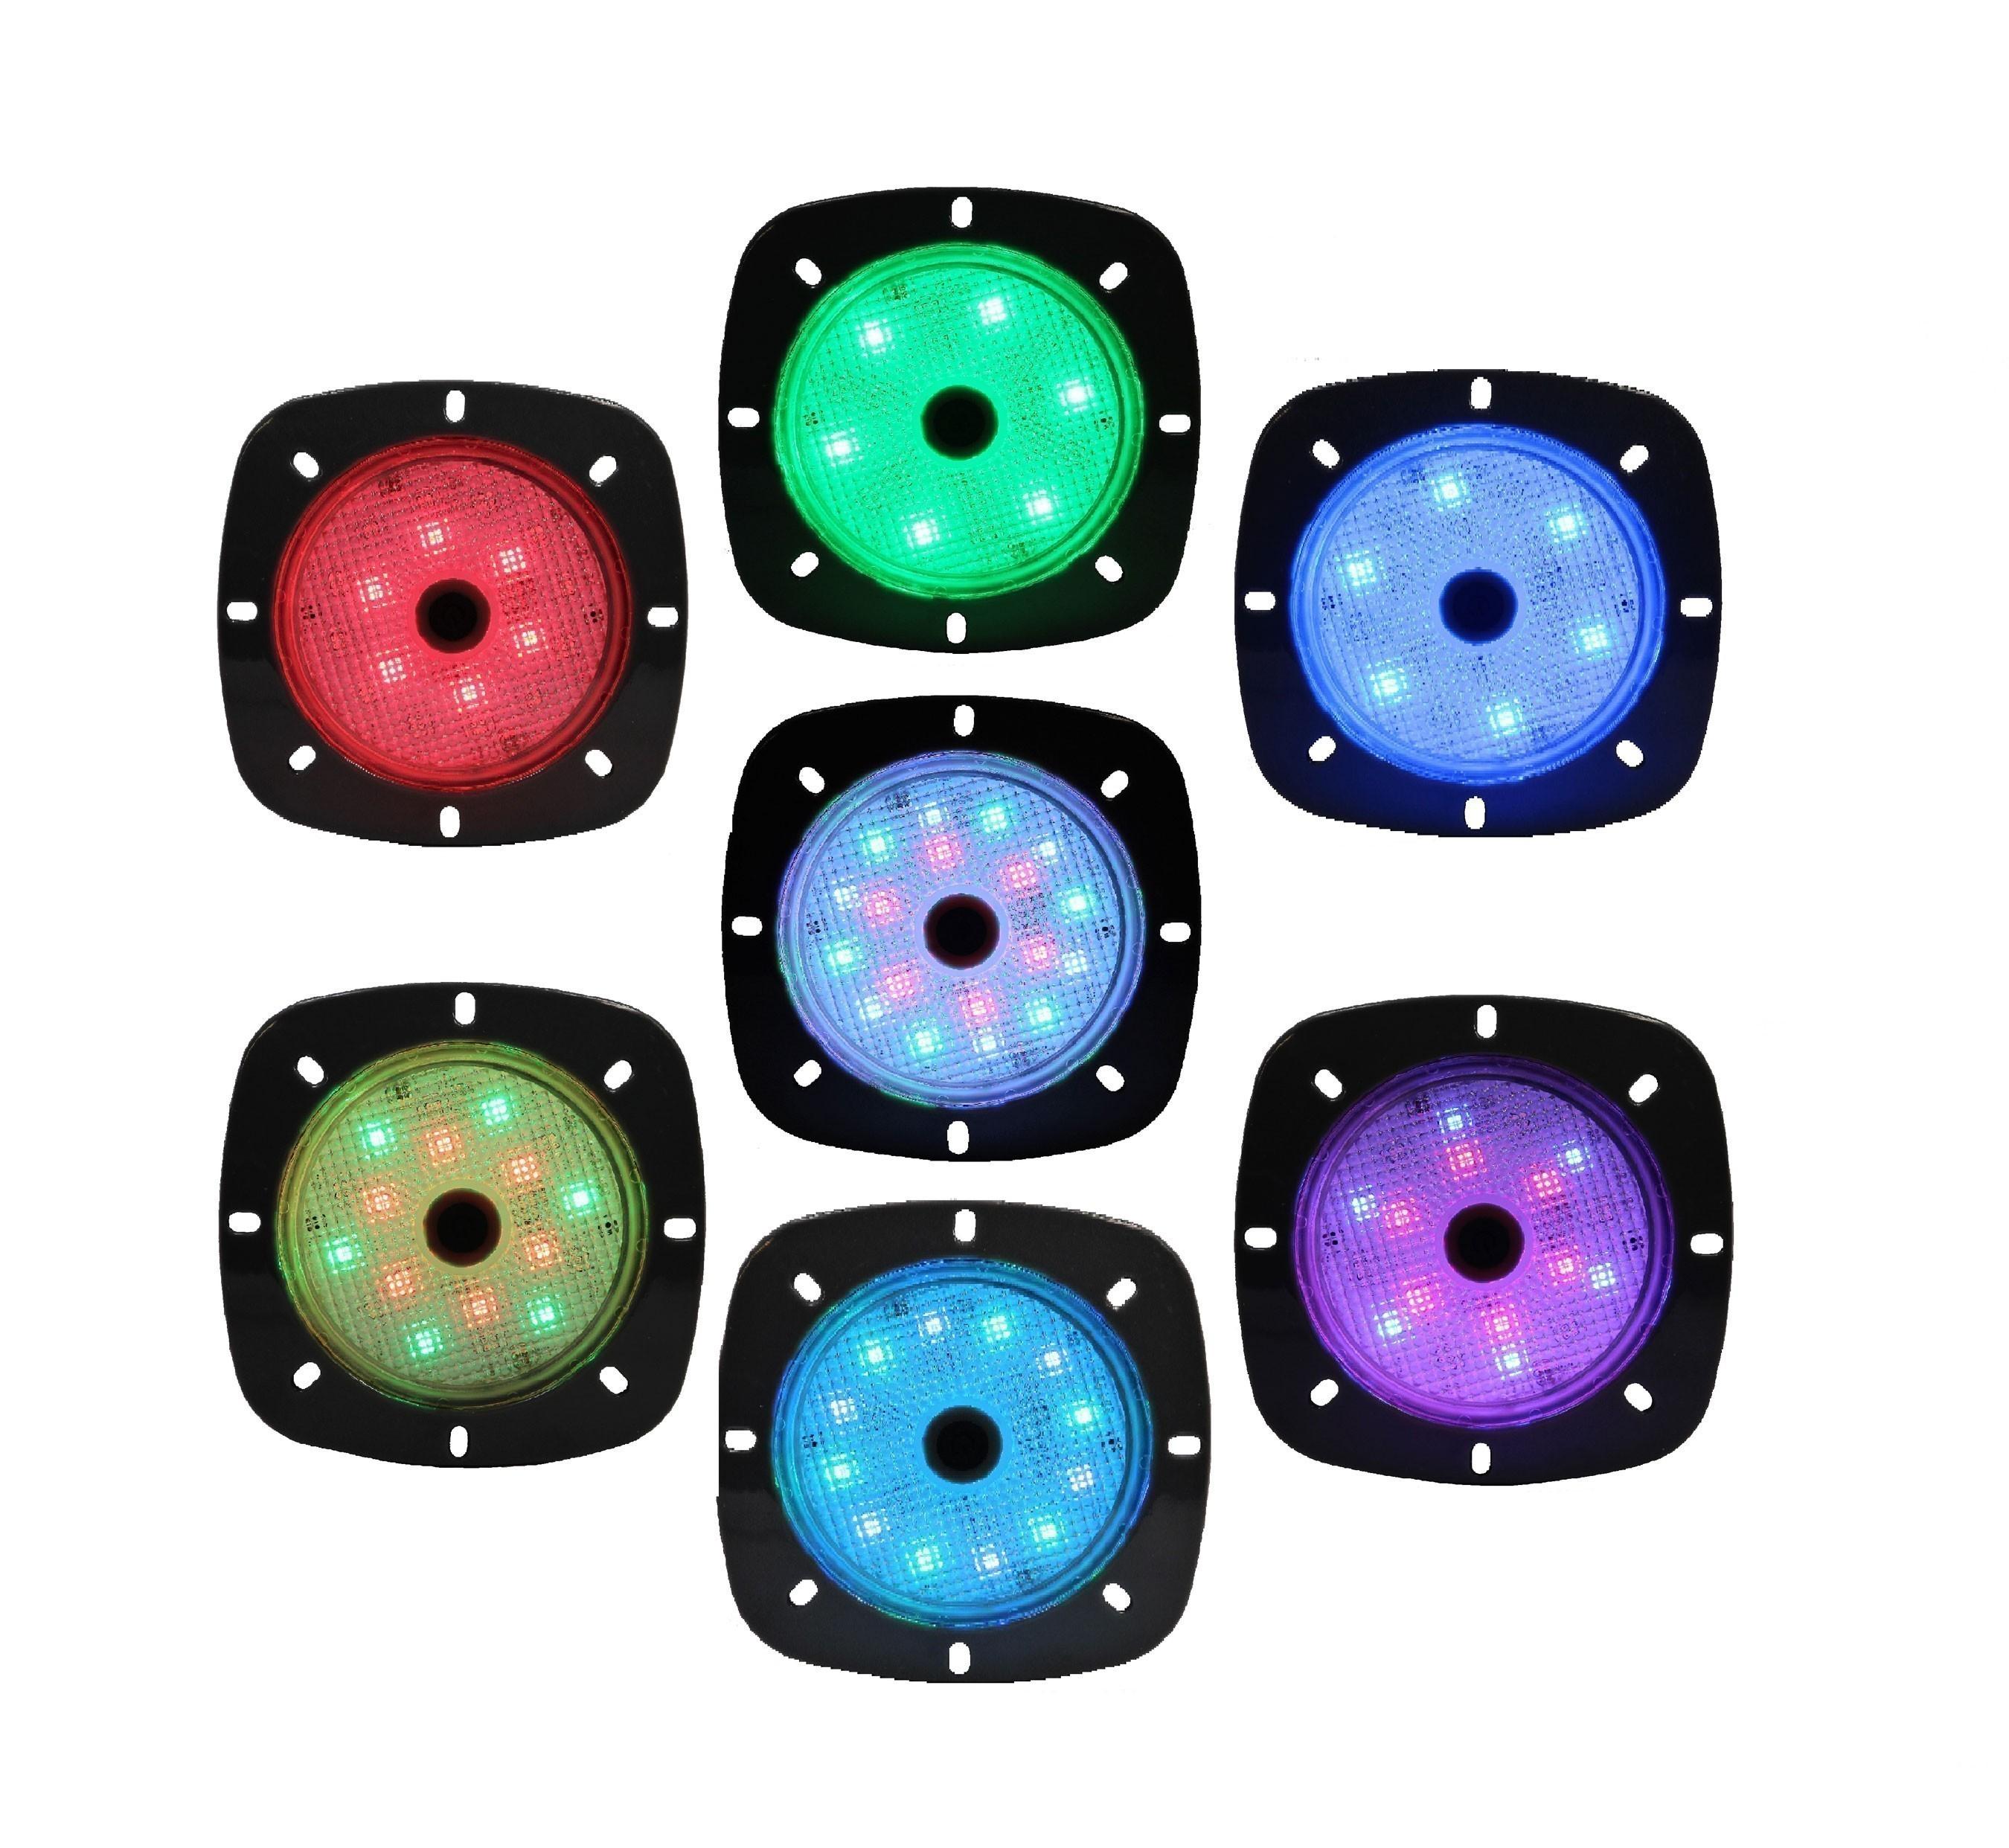 Poolbeleuchtung LED myPool LED-Magnet-Scheinwerfer weiß/RGB Bild 3